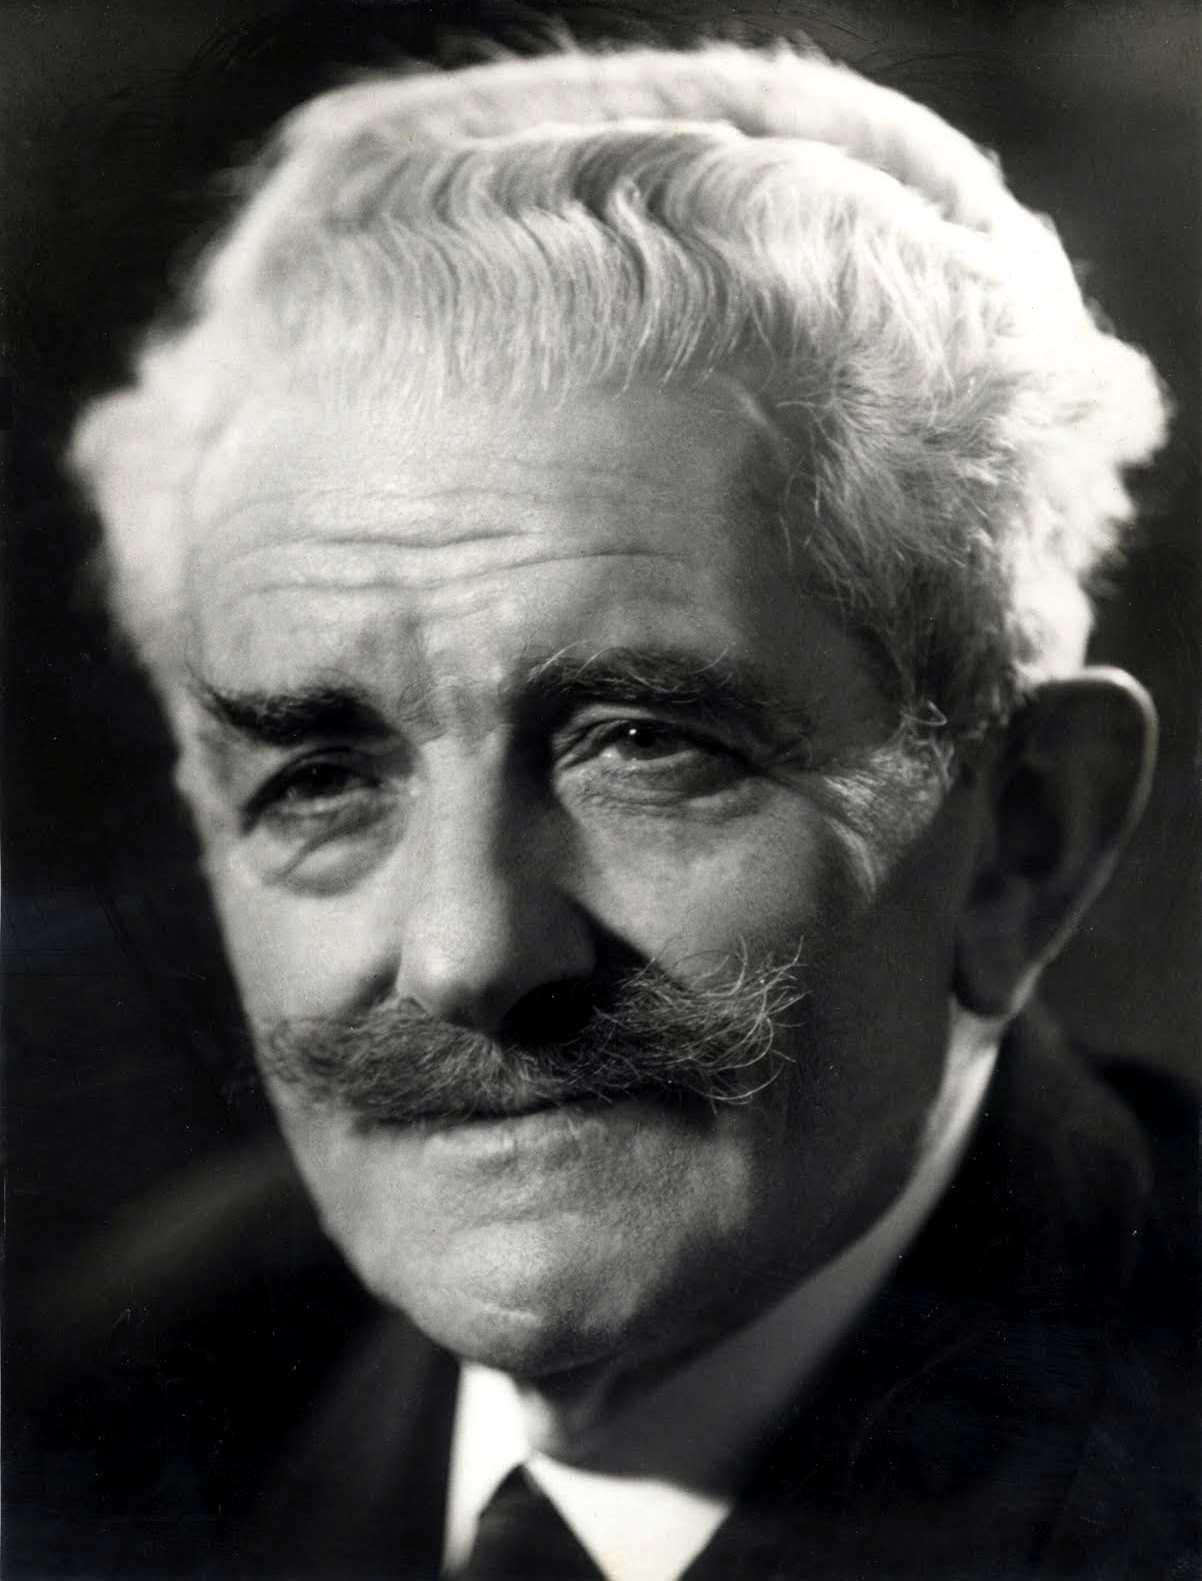 José Pasín Romero